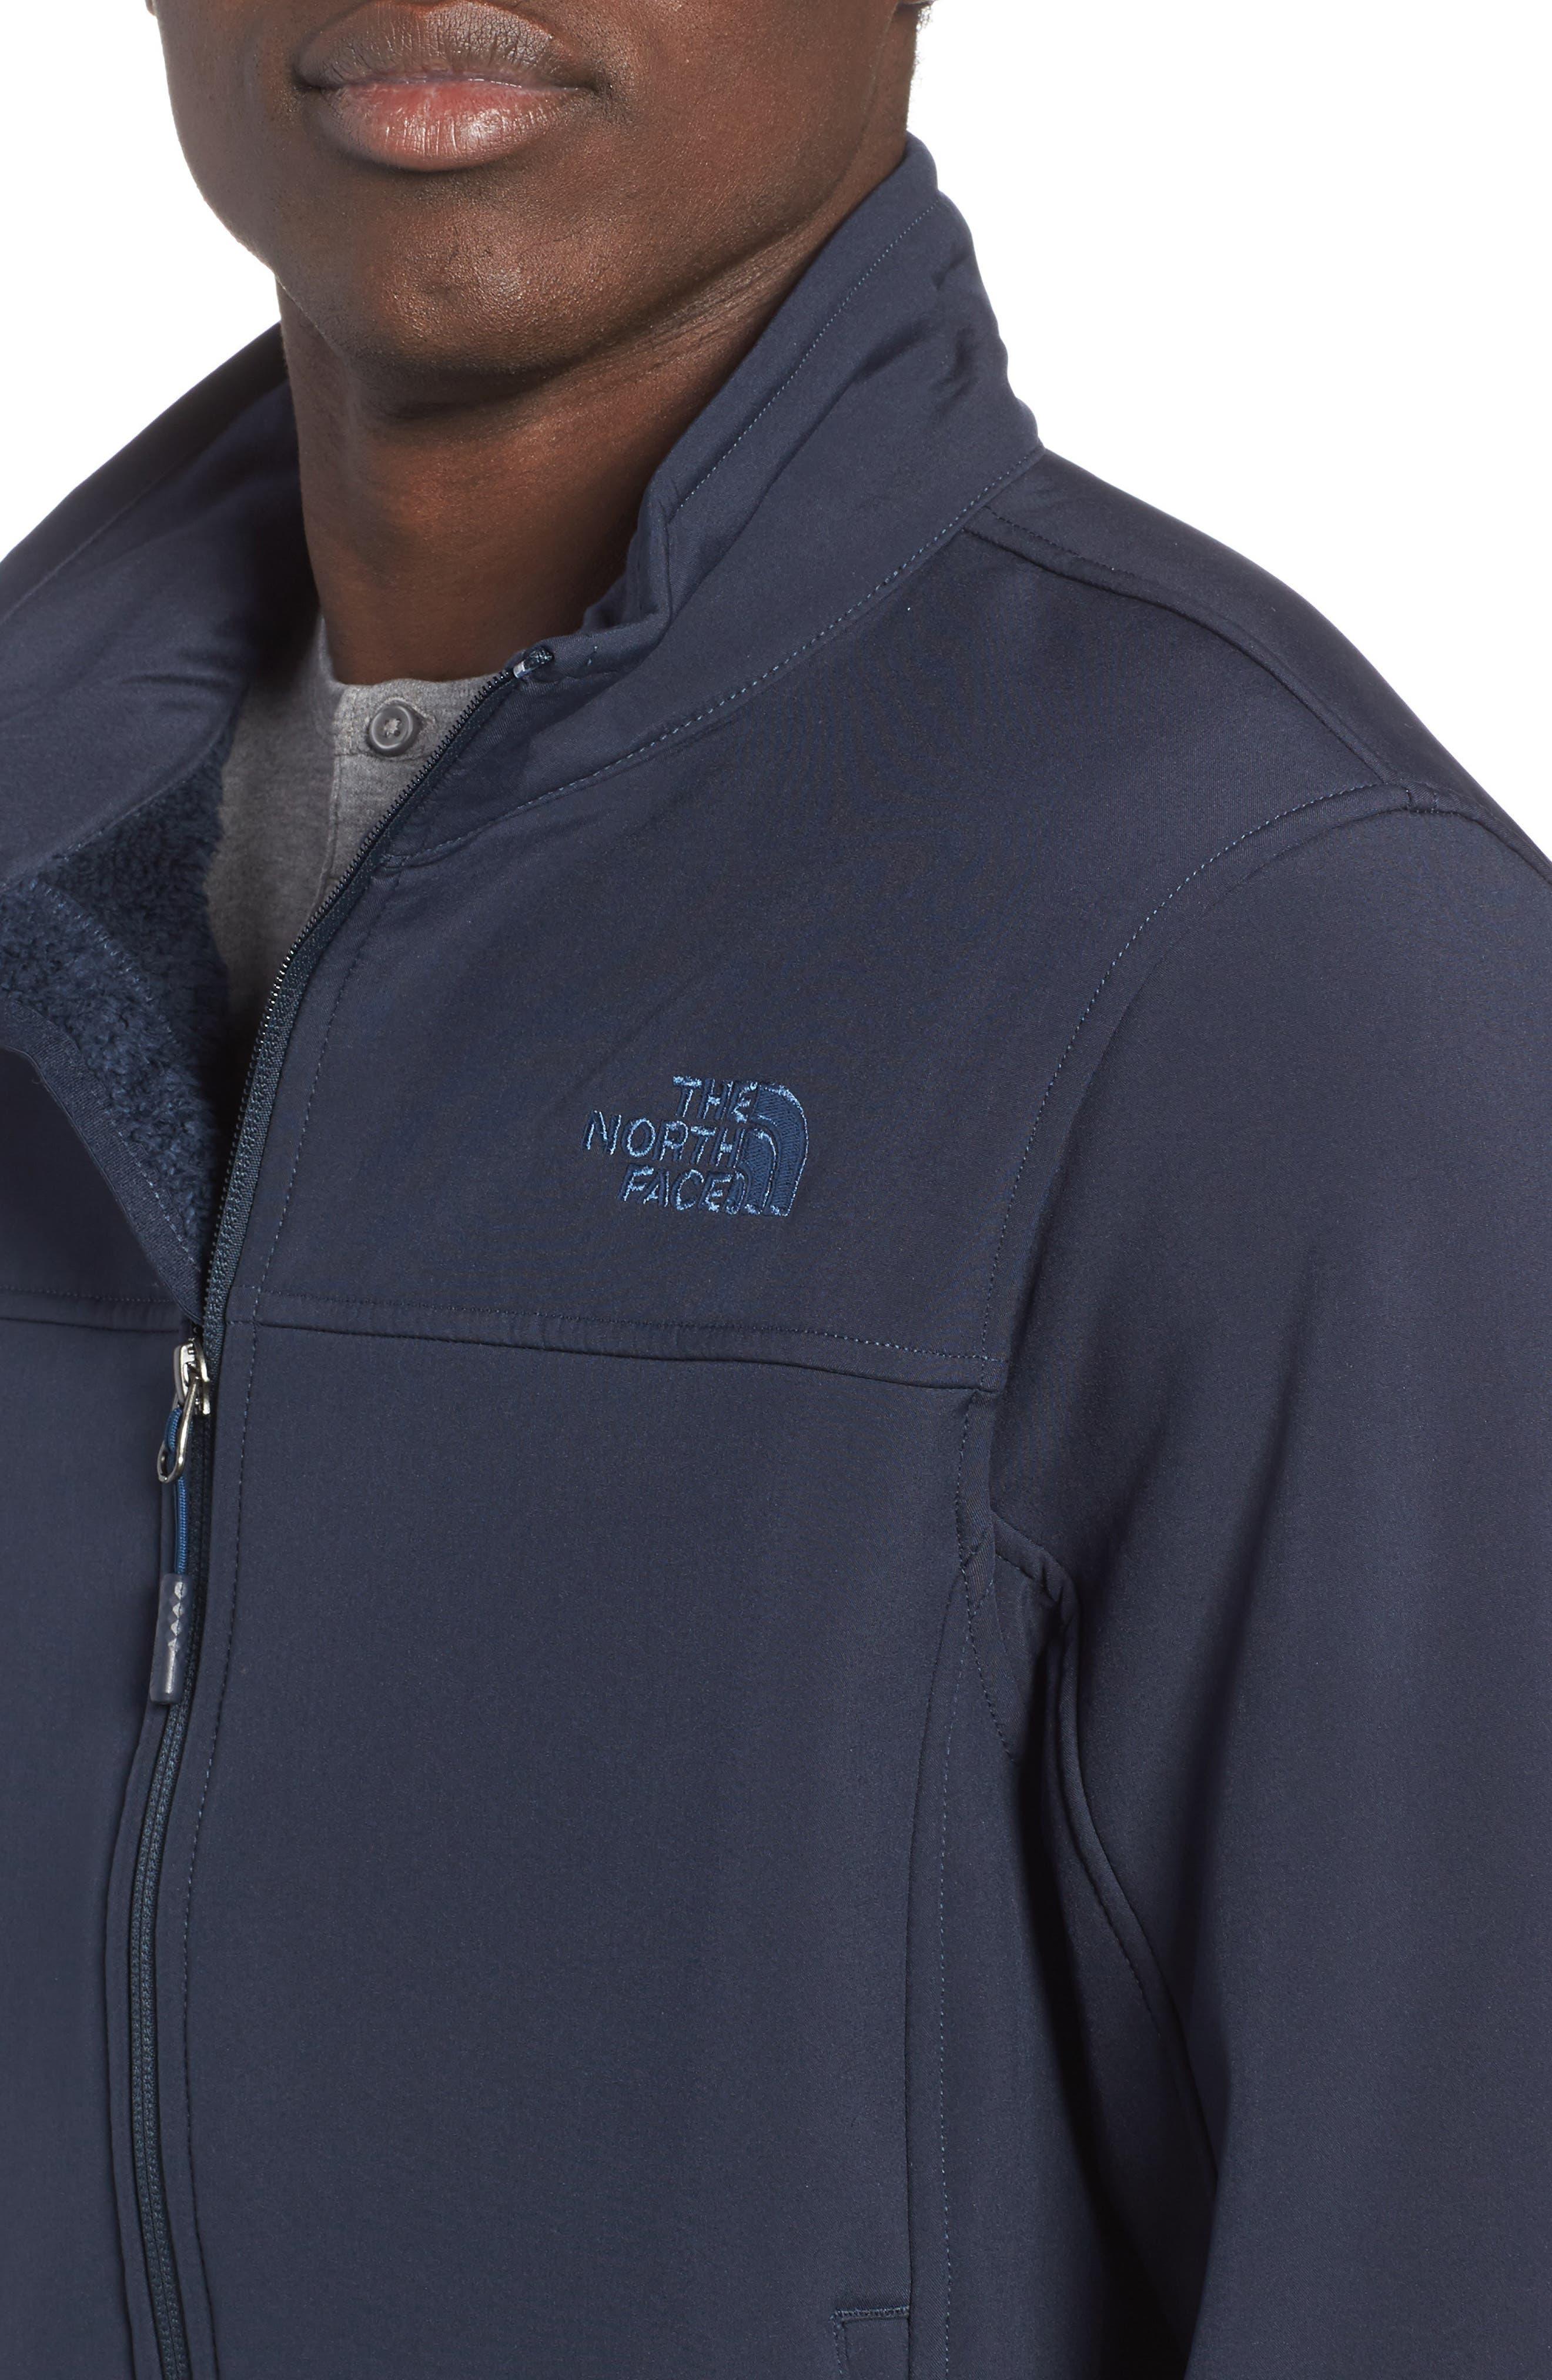 'Apex Chromium' Waterproof Thermal Jacket,                             Alternate thumbnail 4, color,                             401